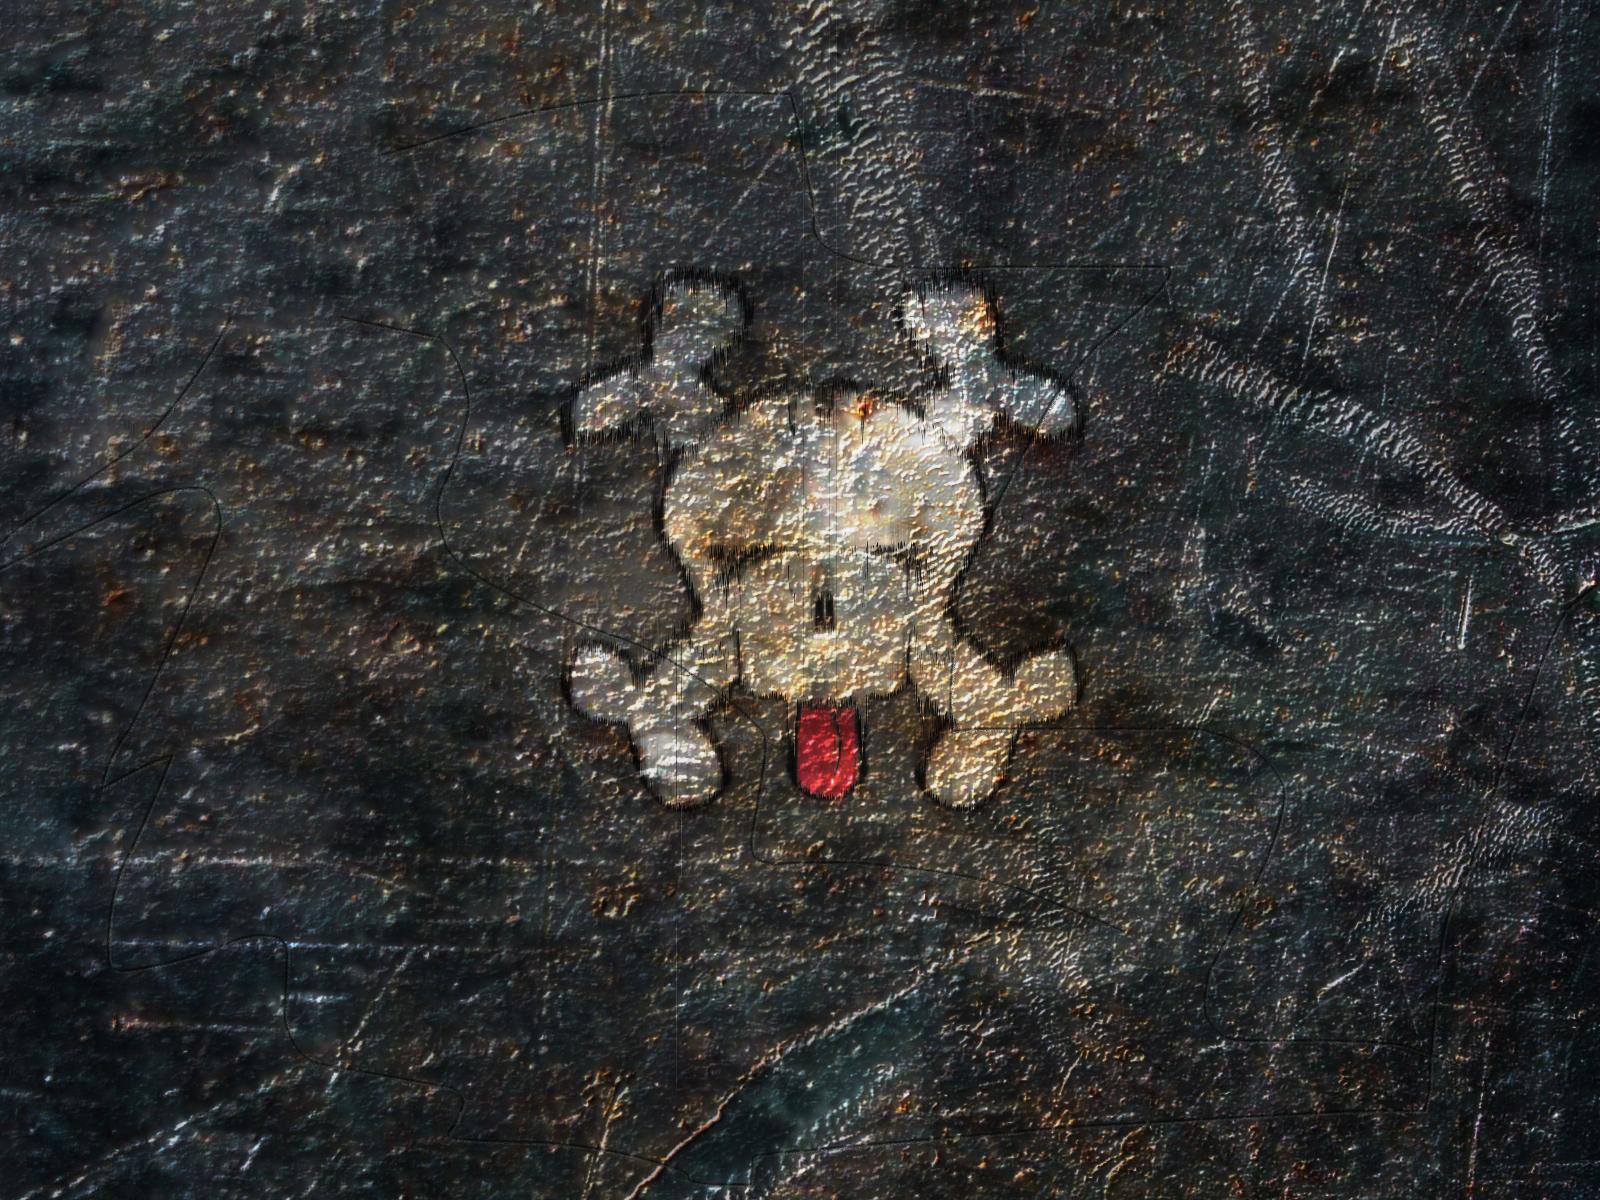 Grunge Jolly Roger by jbensch